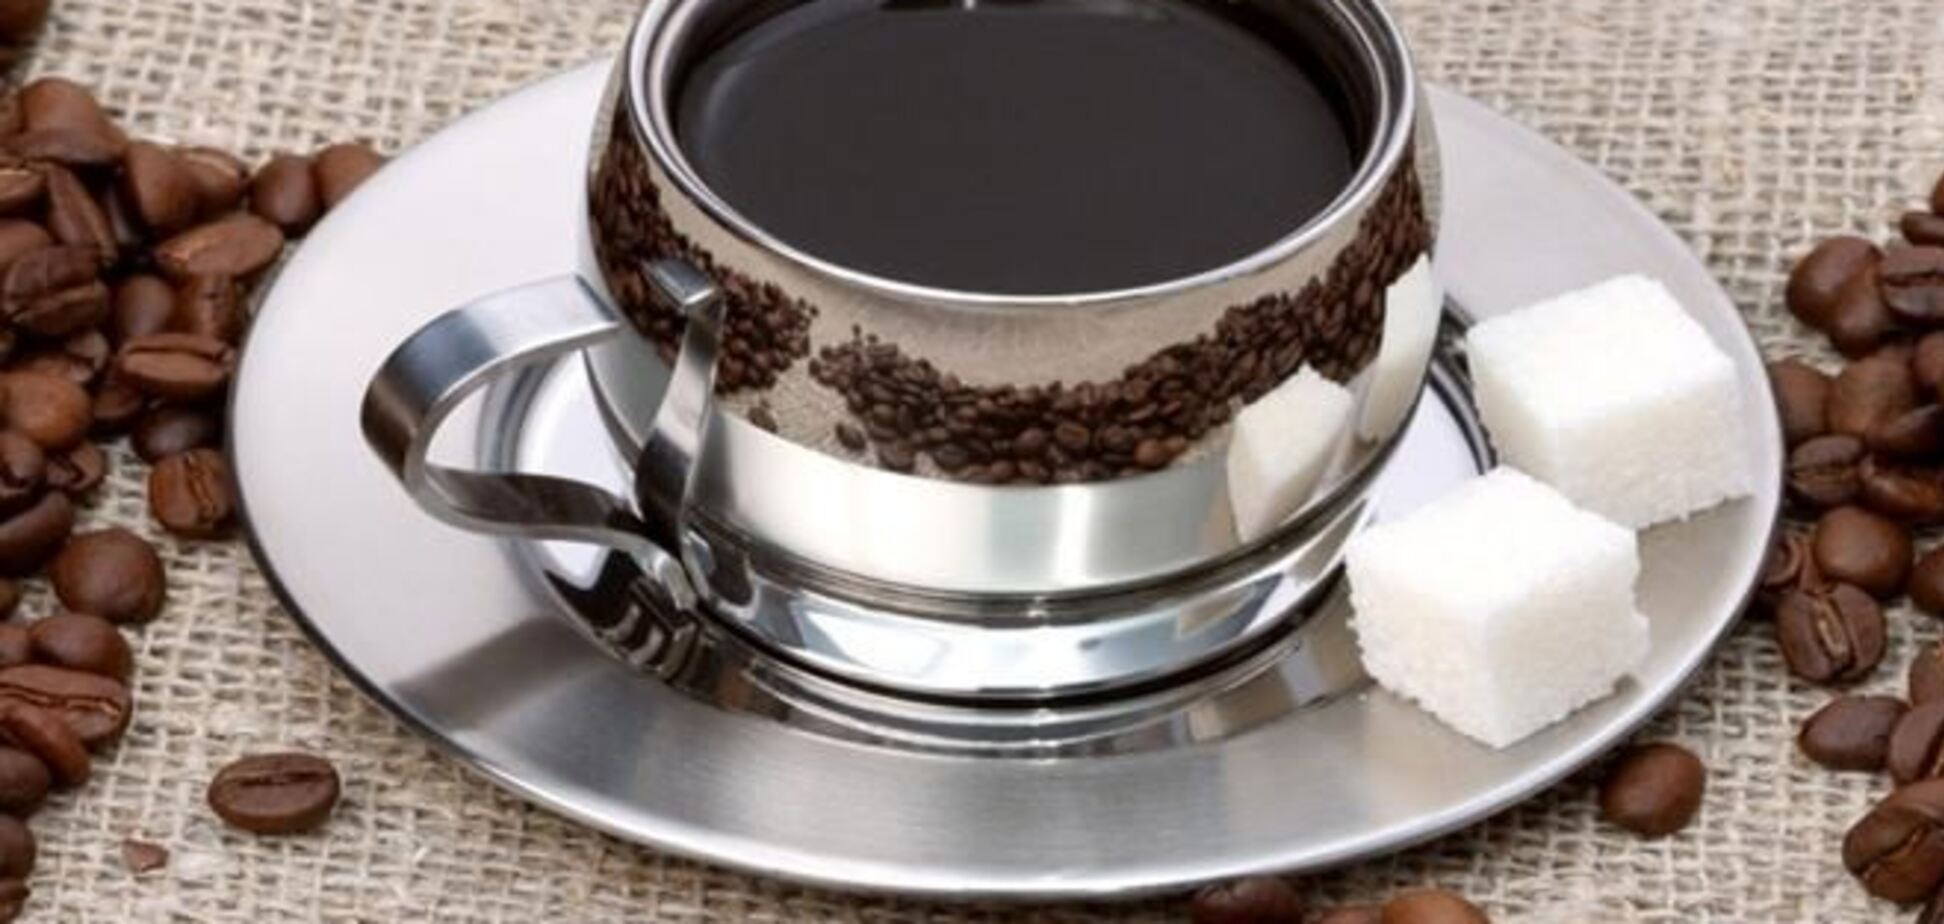 Медики реабилитировали кофе с сахаром